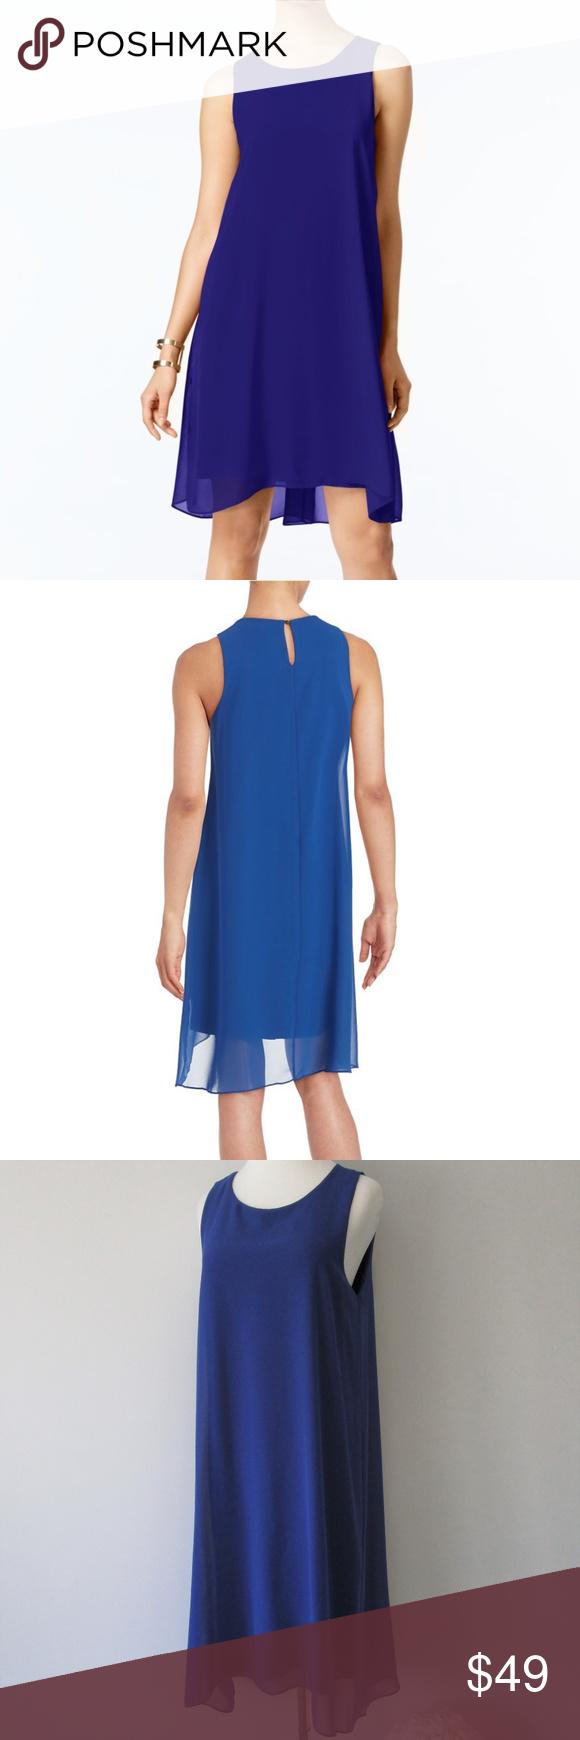 Nwt Vince Camuto Blue Chiffon Hi Low Shift Dress Midi Shift Dress Dresses Cocktail Evening Dresses [ 1740 x 580 Pixel ]